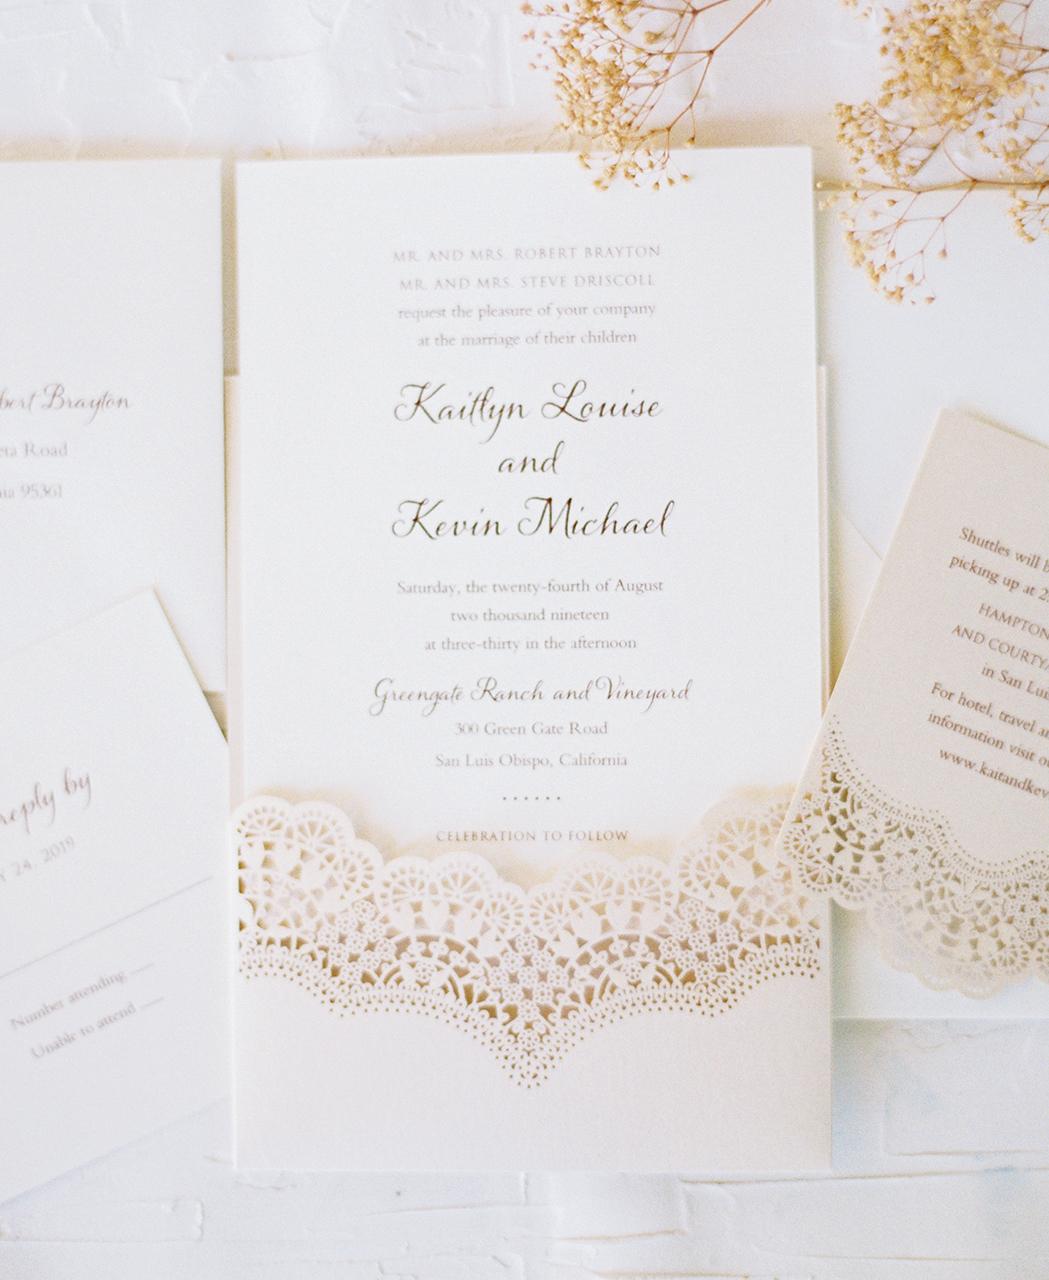 wedding invitation suite neutral color gold accent lace cut-outs